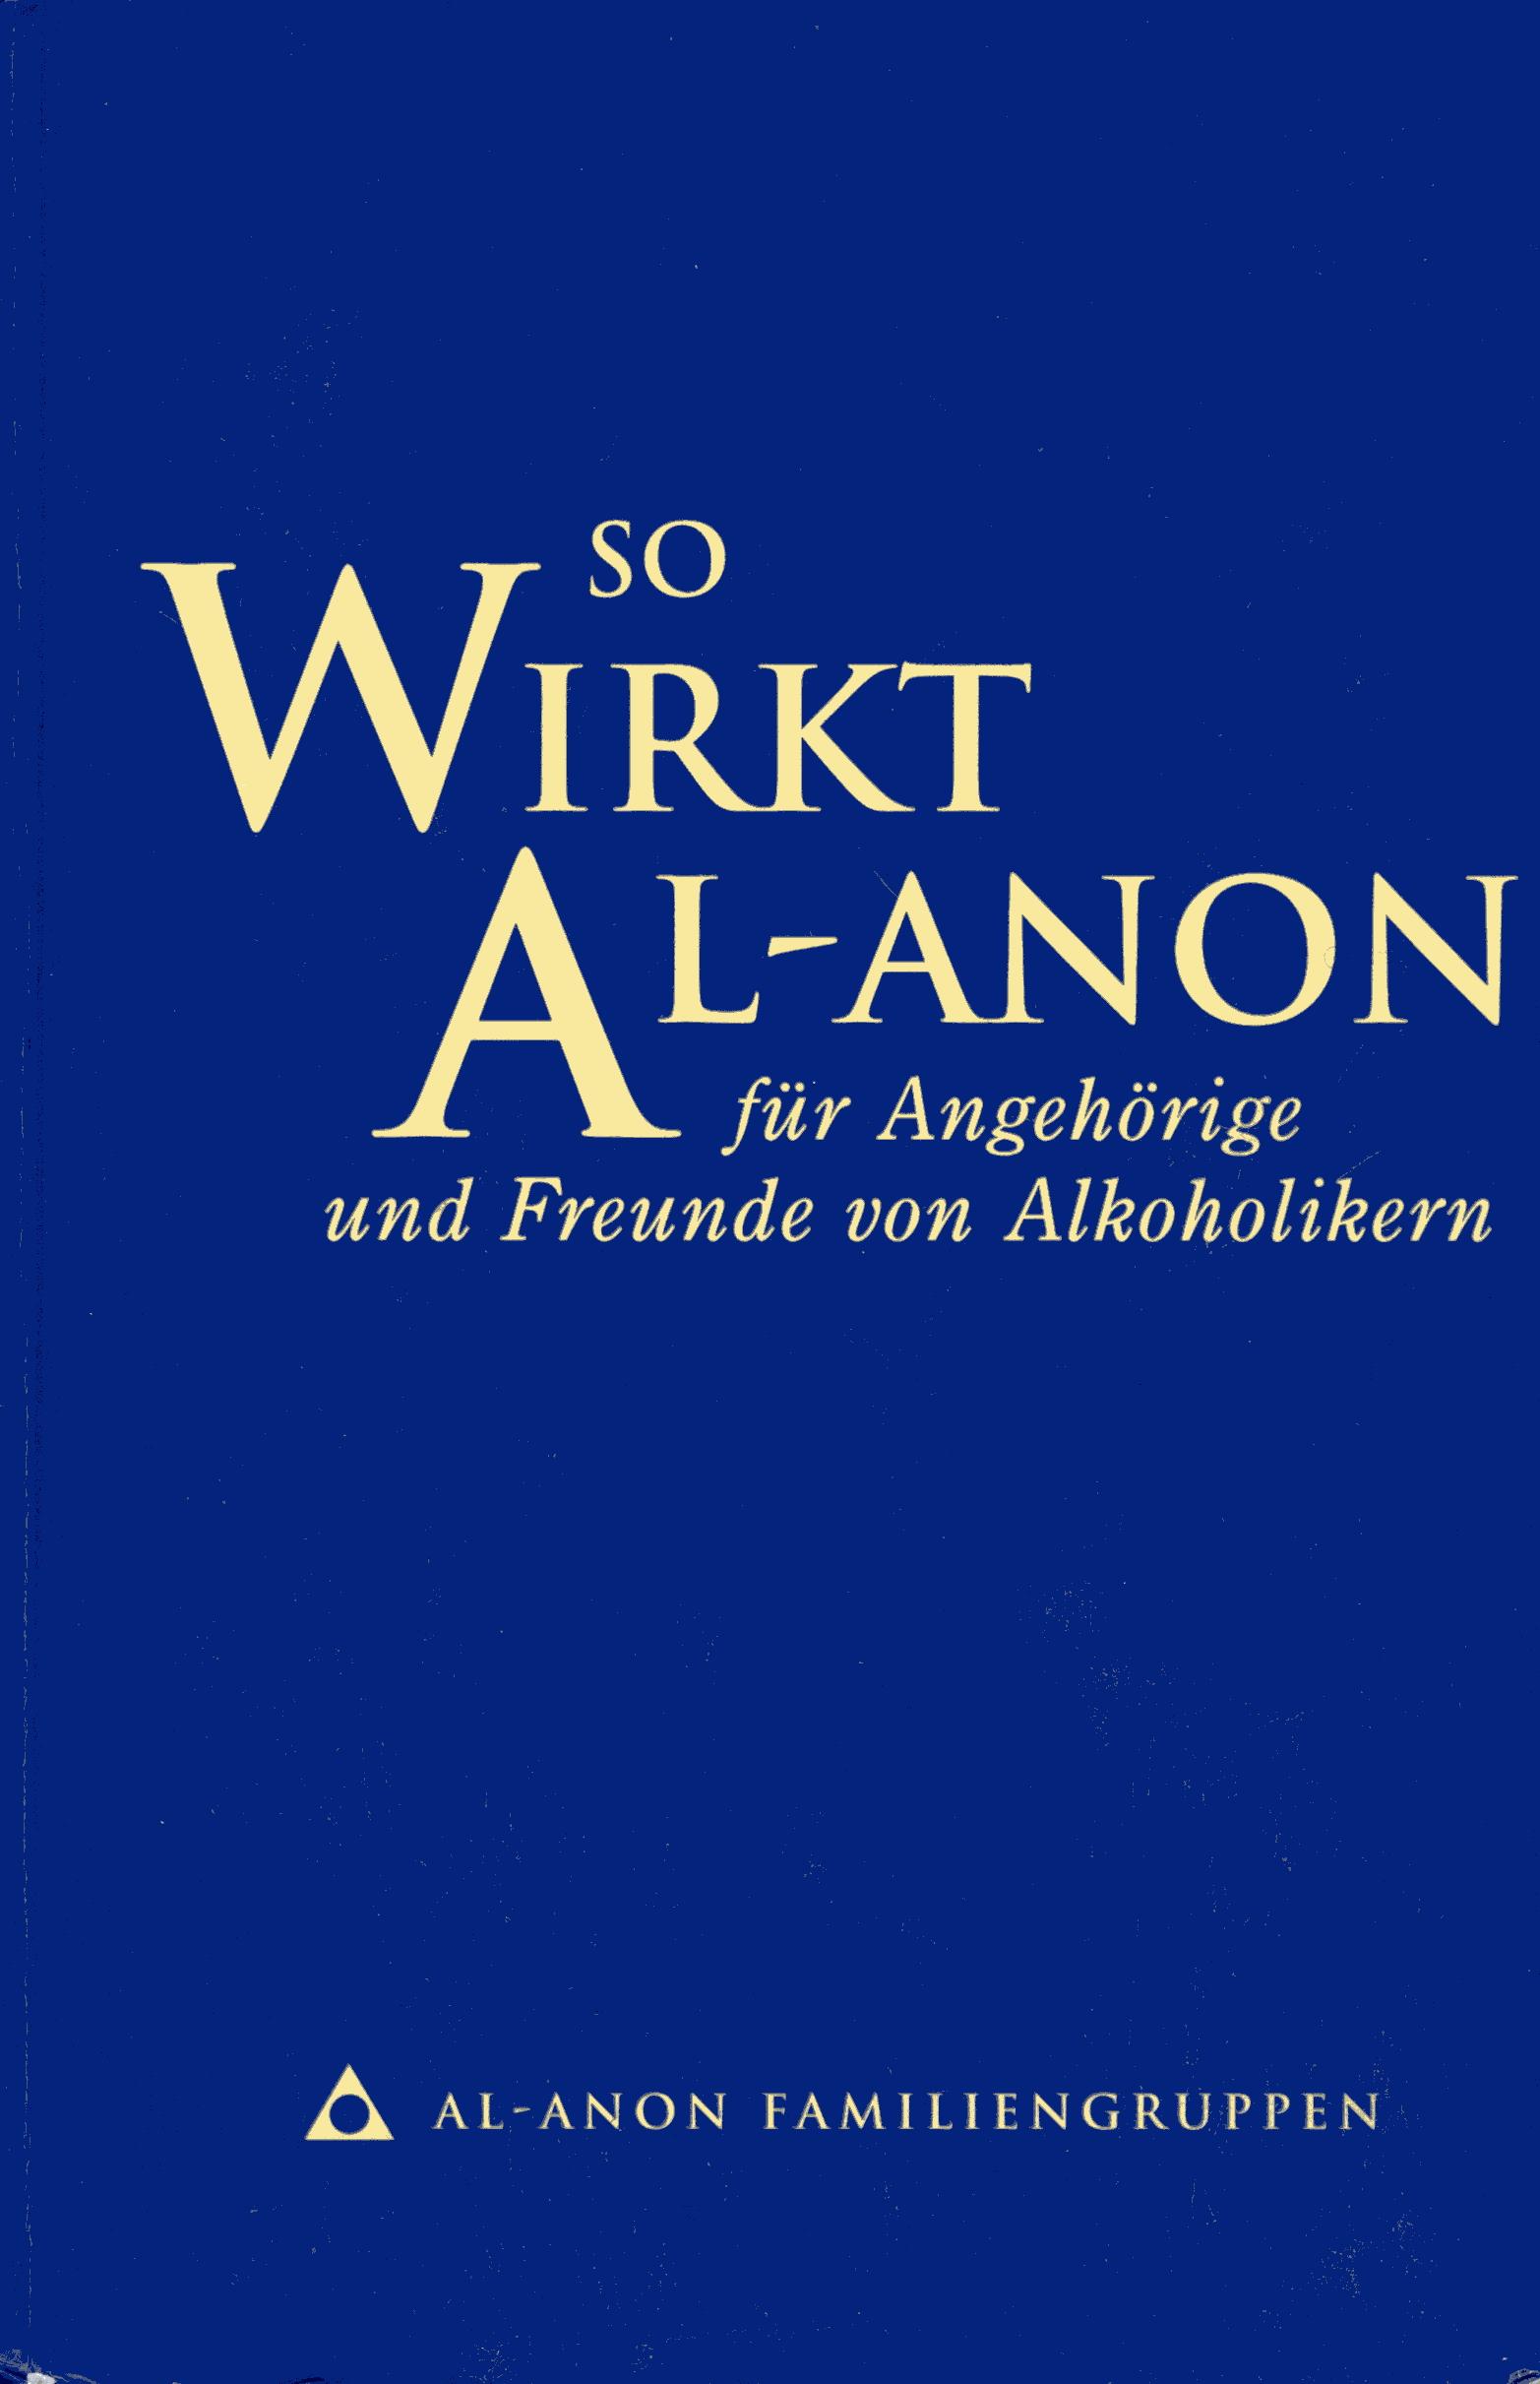 SowirktAlAnon